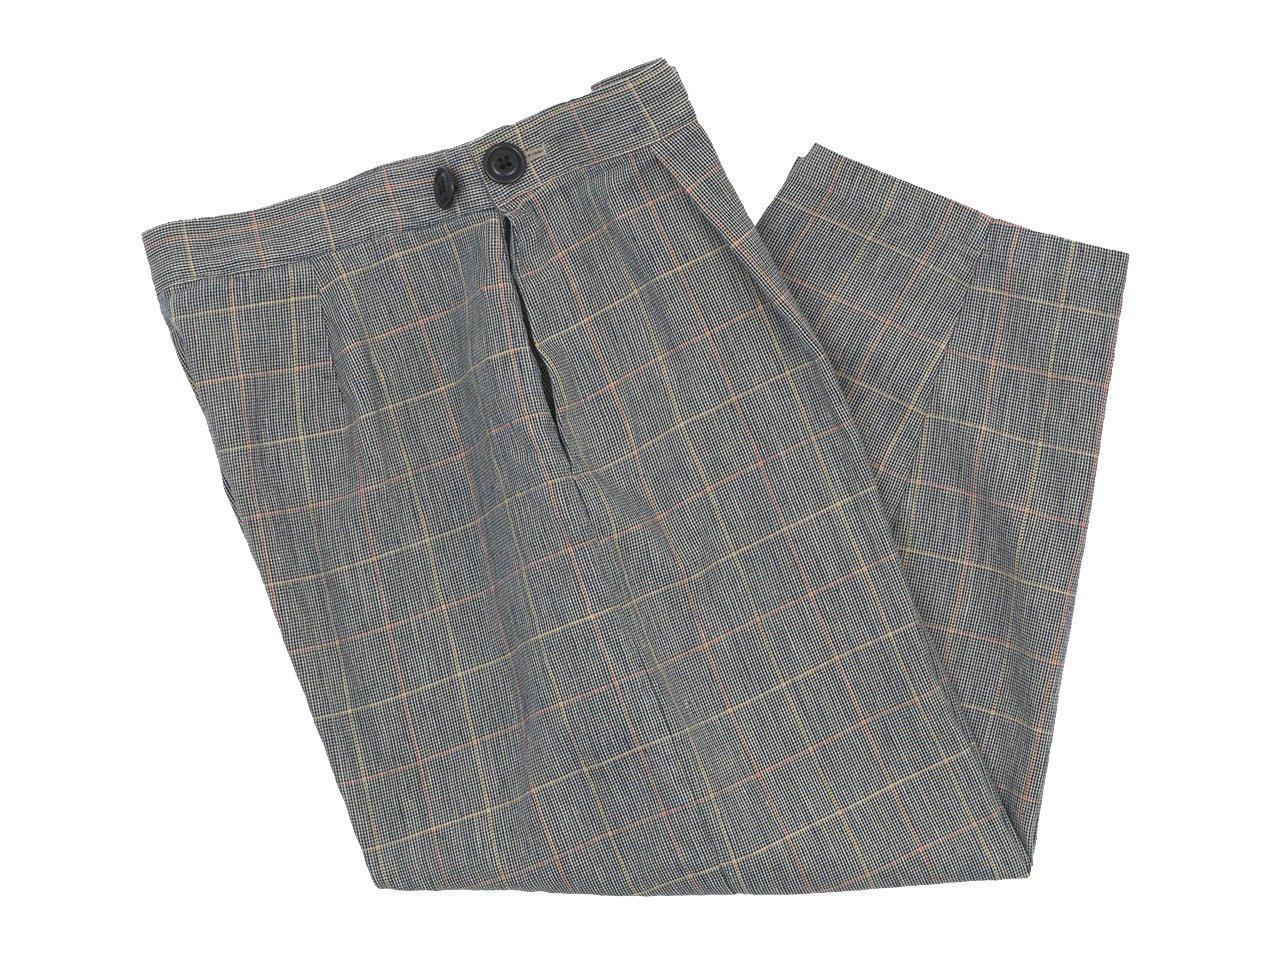 Atelier d'antan Salvador(サルヴァドール) tack pants Cotton Linen NAVY CHECK